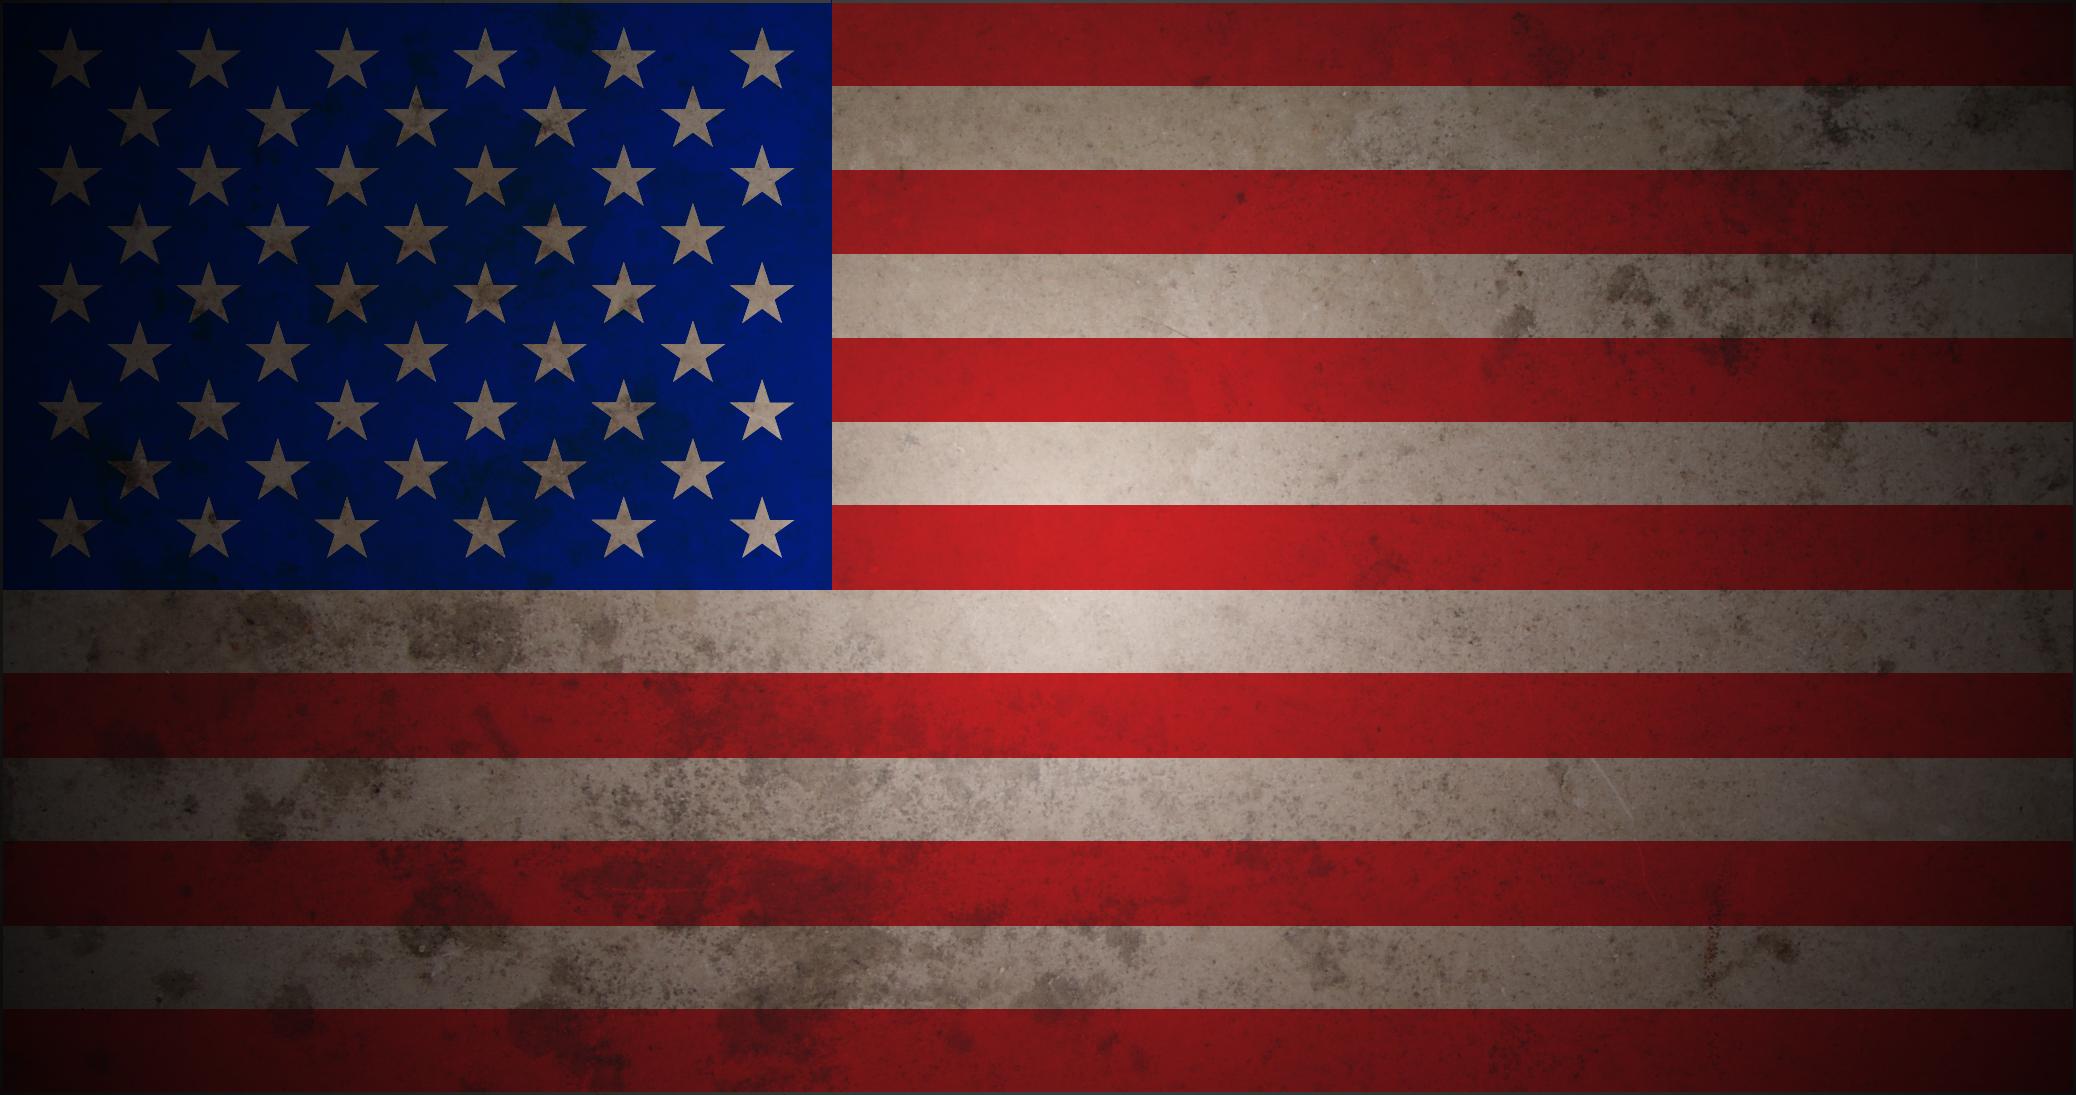 flags usa american flag desktop 2076x1095 hd wallpaper 157877 2076x1095